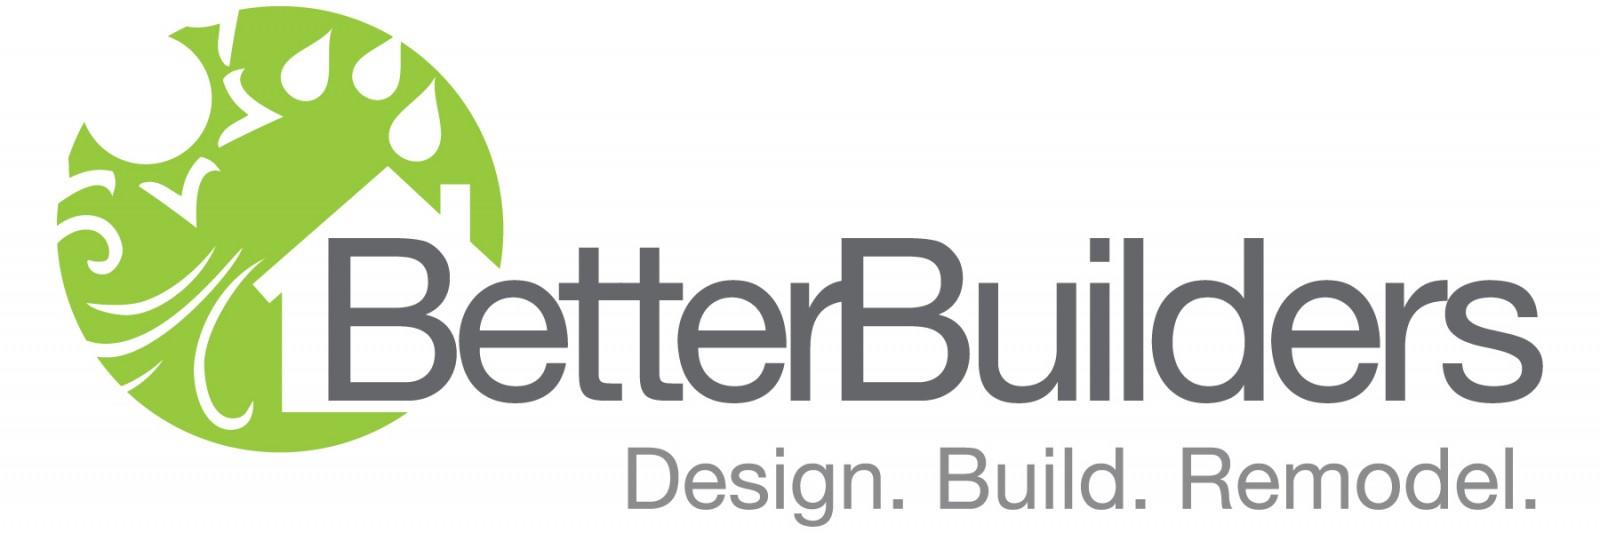 Better Builders